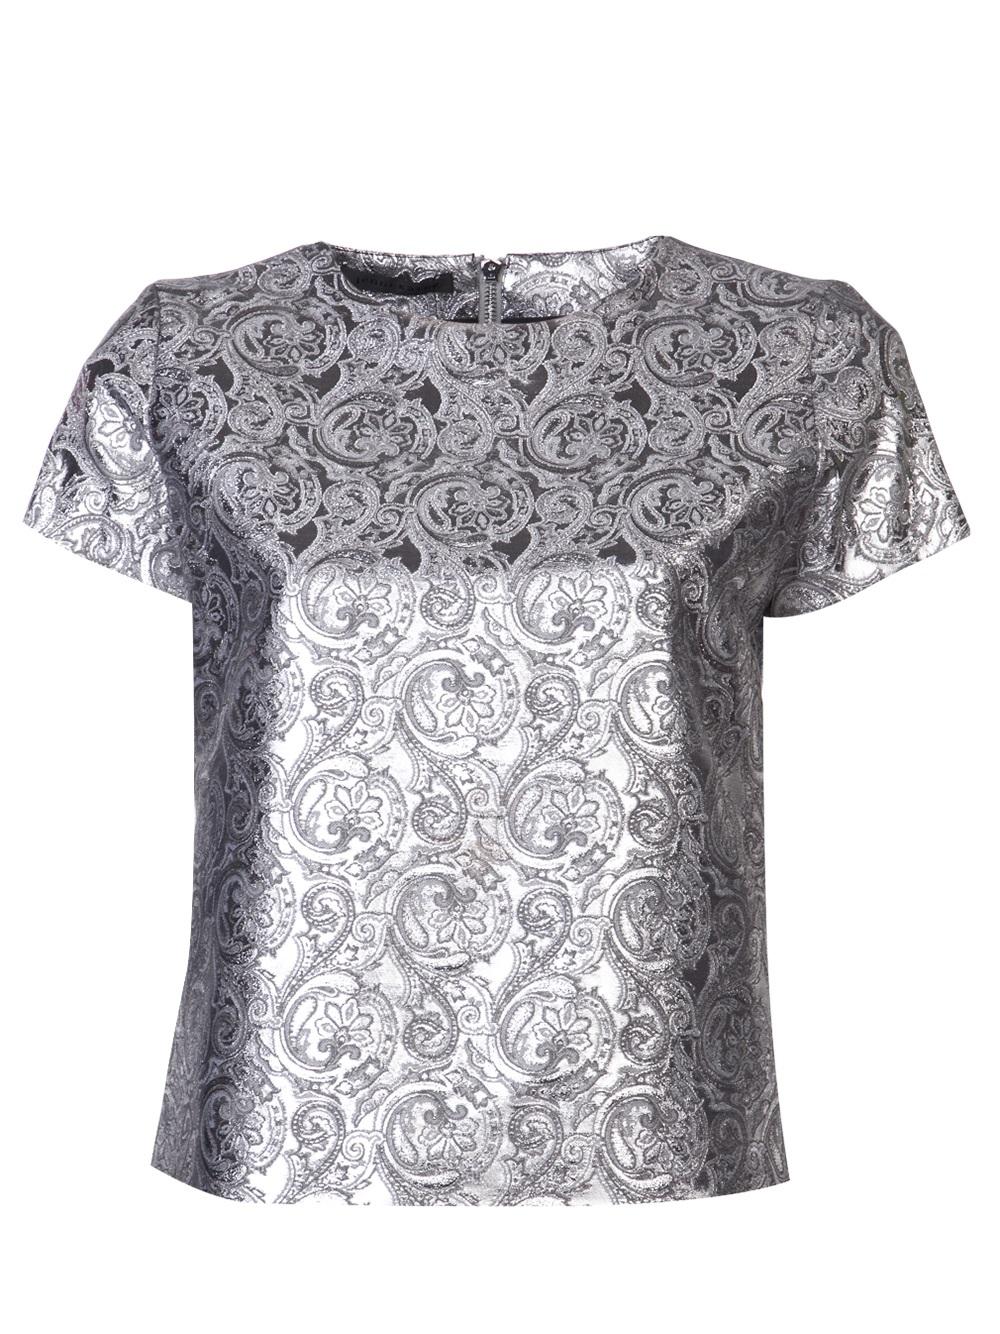 Lyst jenni kayne metallic print top in metallic for Silver metallic shirt women s